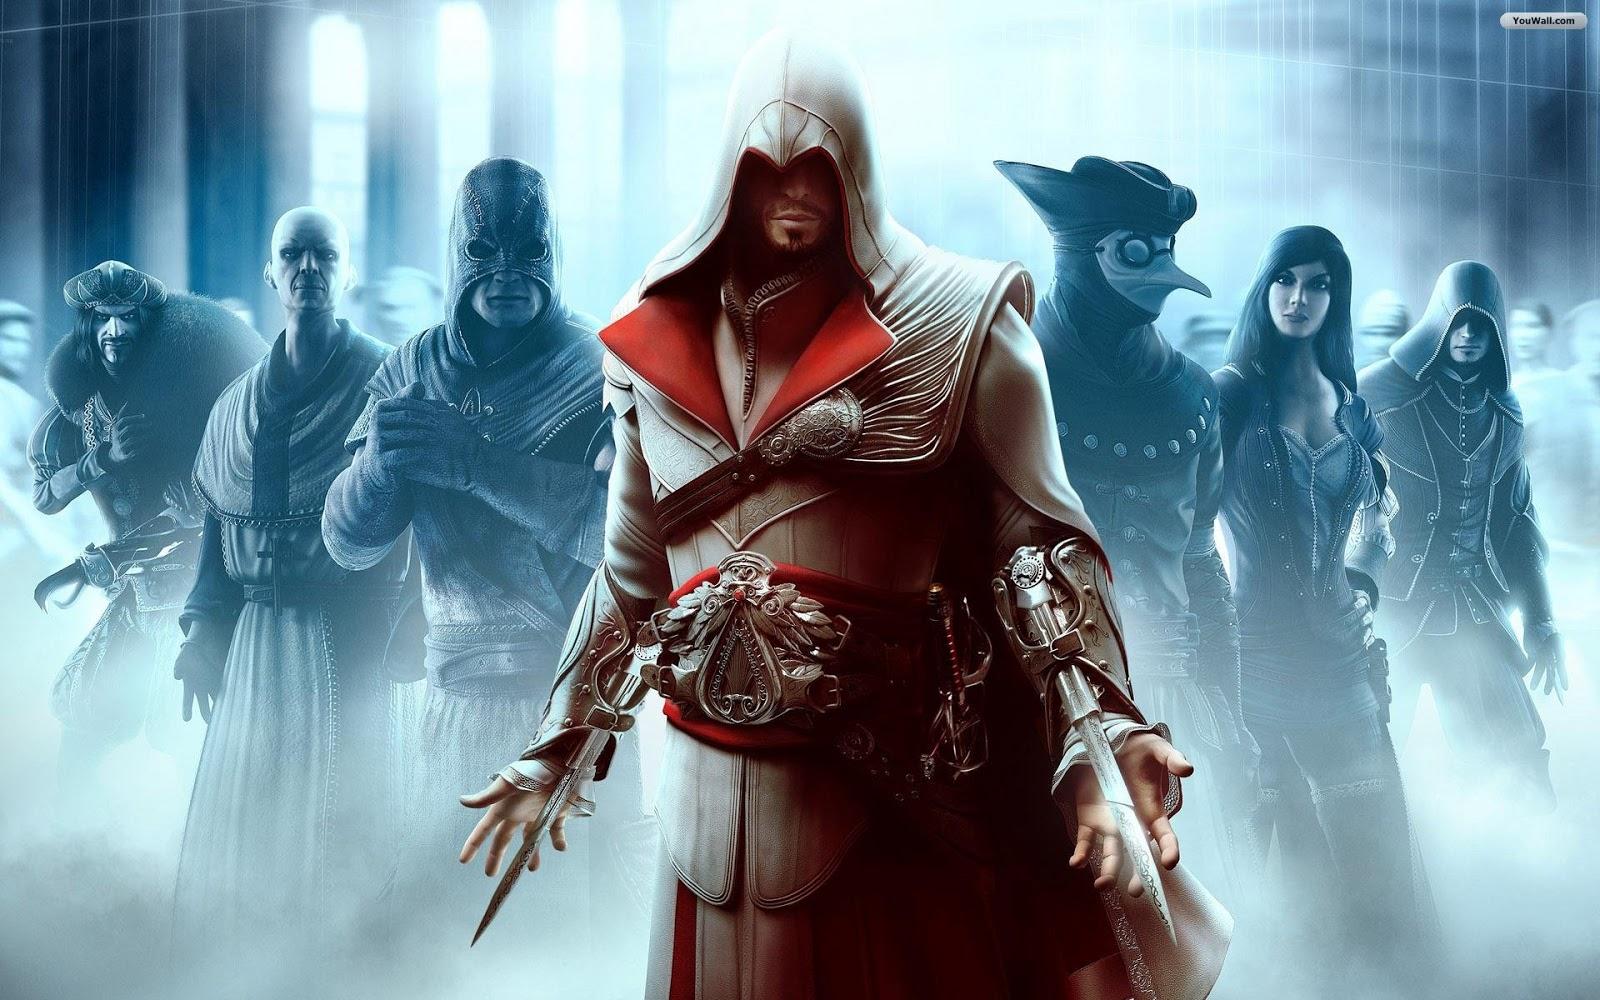 Assassins Creed Brotherhood Wallpaper: Assassins Creed Brotherhood Game Wallpapers HD